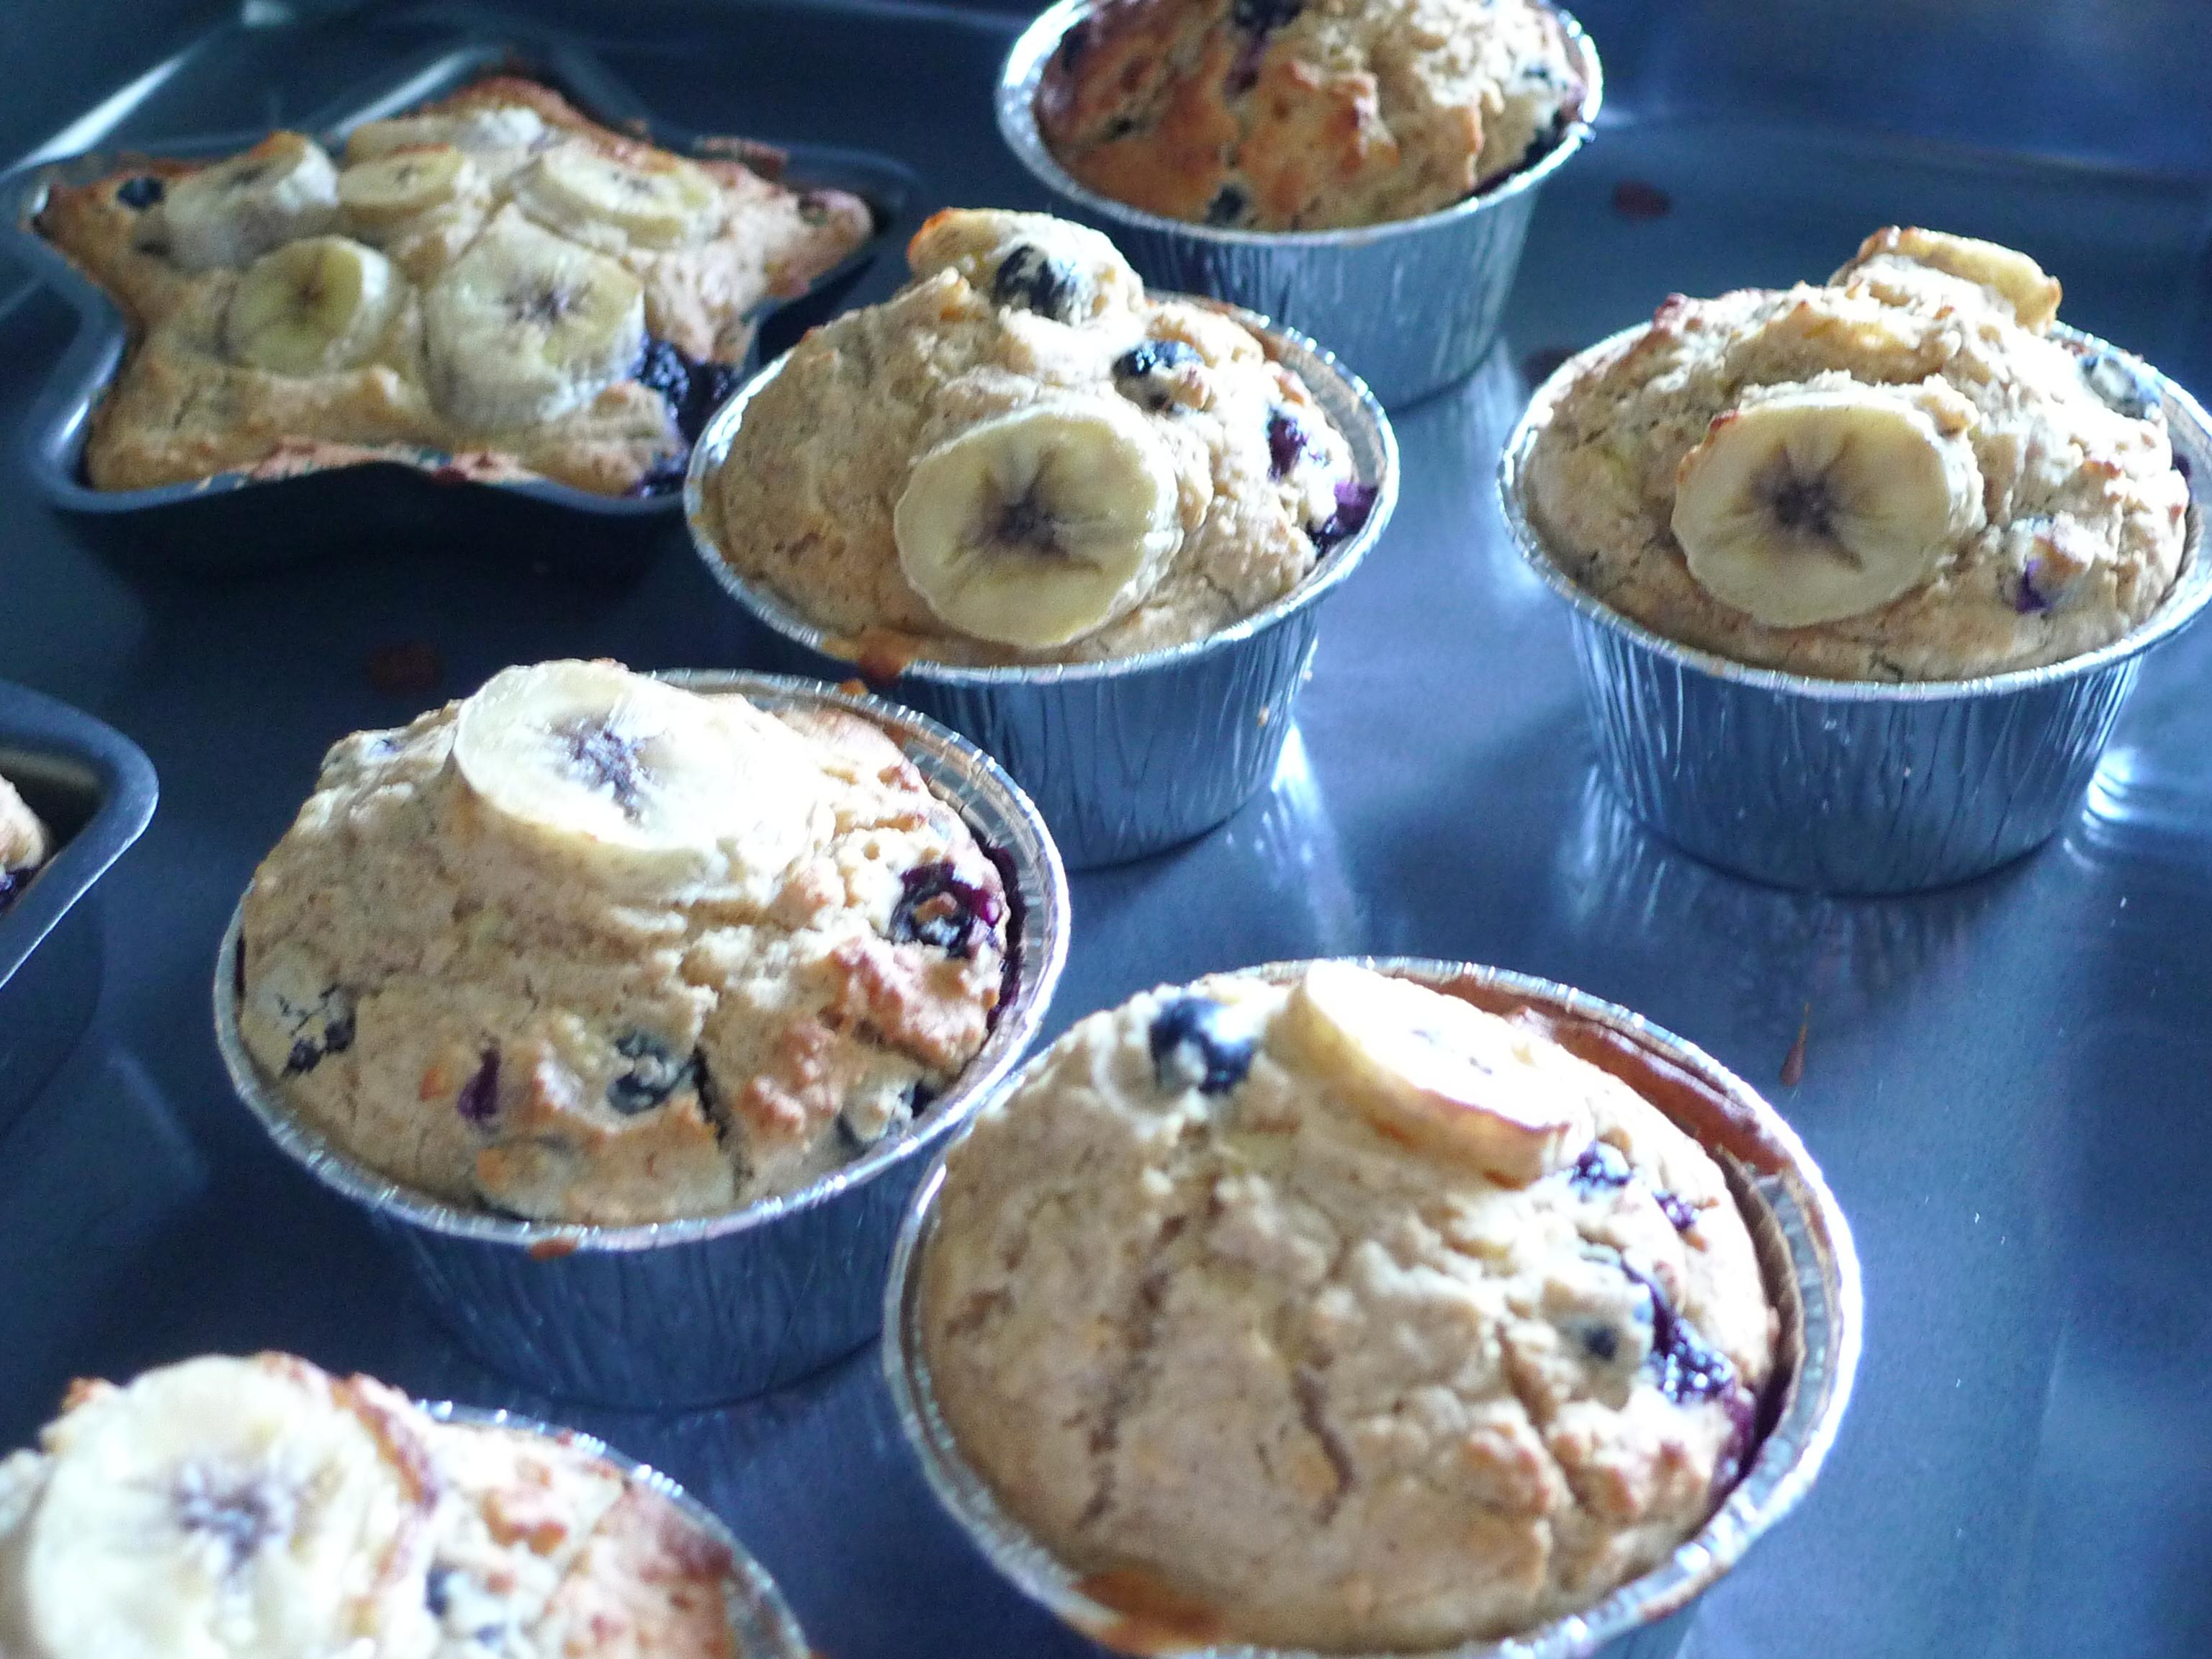 Baby Food Recipe: Blueberry Oats and Yogurt Baby Food Recipe: Blueberry Oats and Yogurt new picture